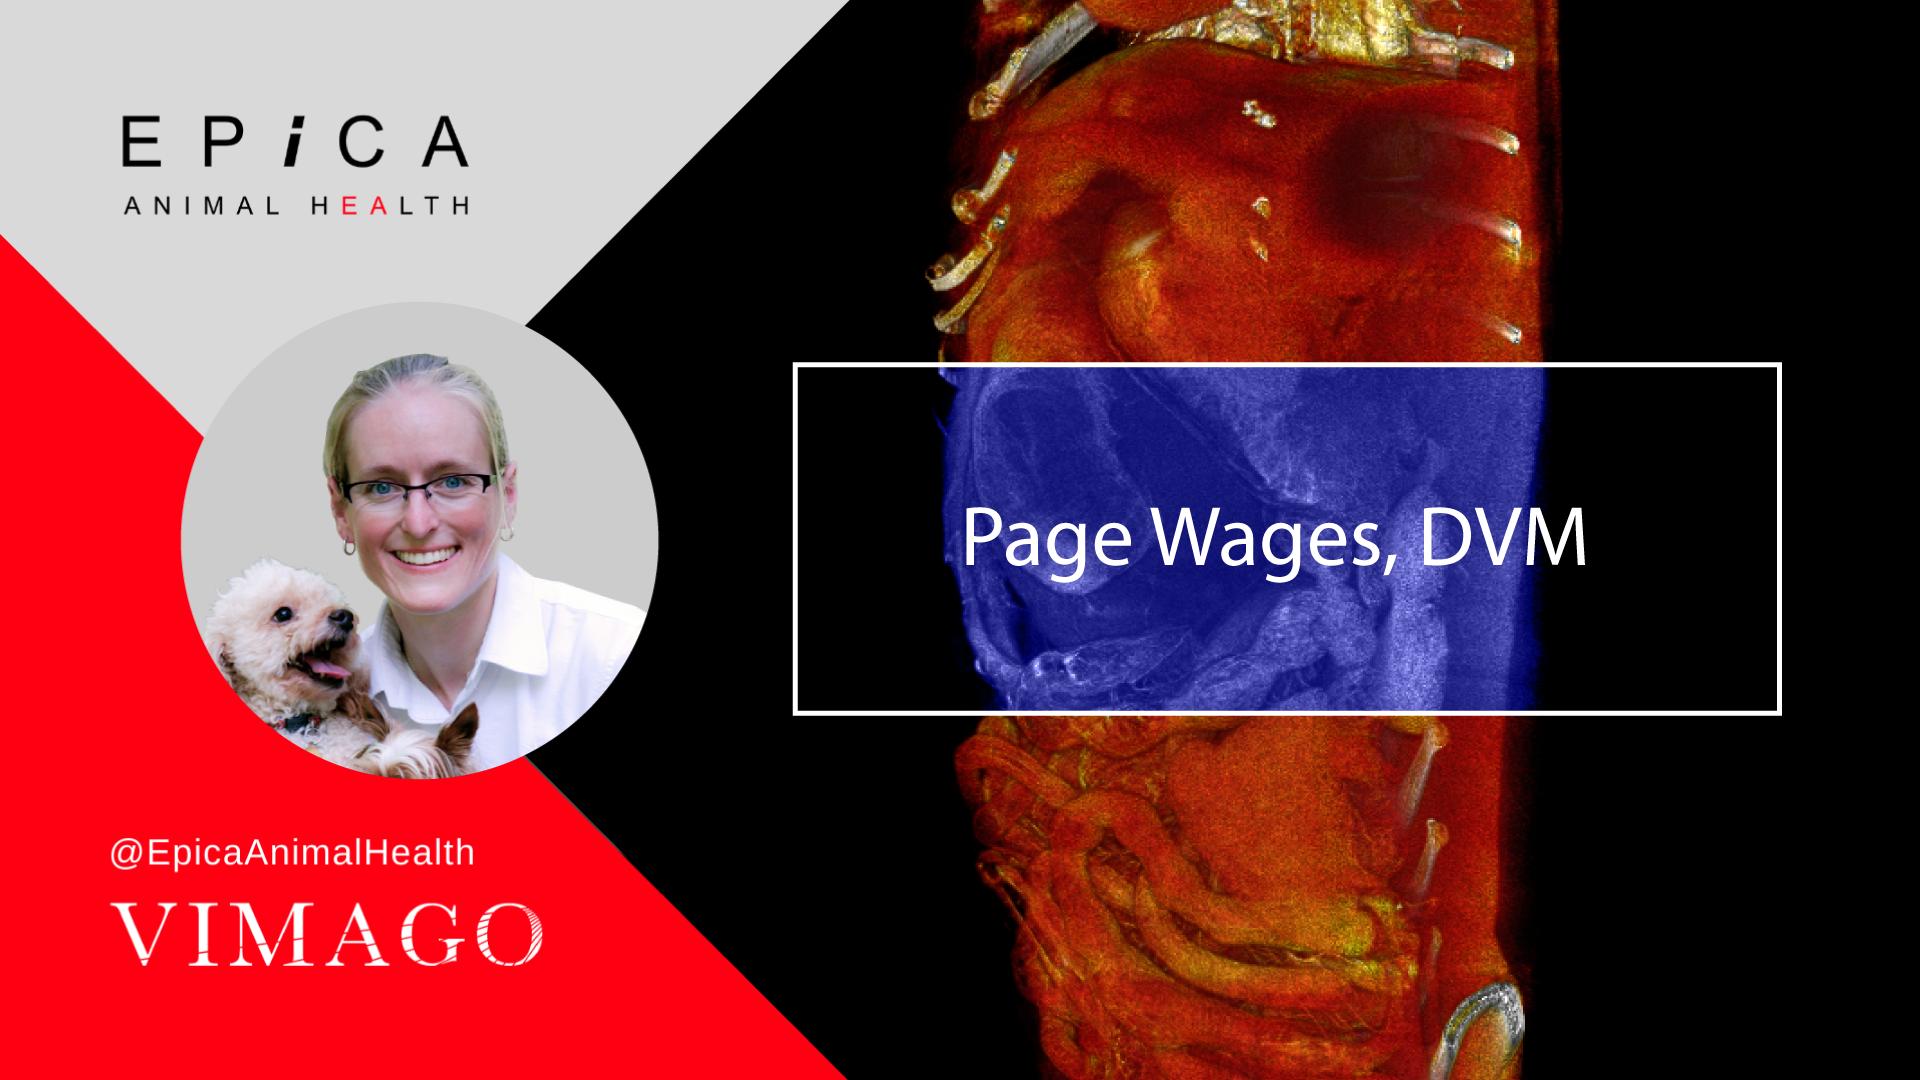 EAH-2021---Vimago-E-Report-Web-Banner---Page-Wages-DVM---1080x1920-V4